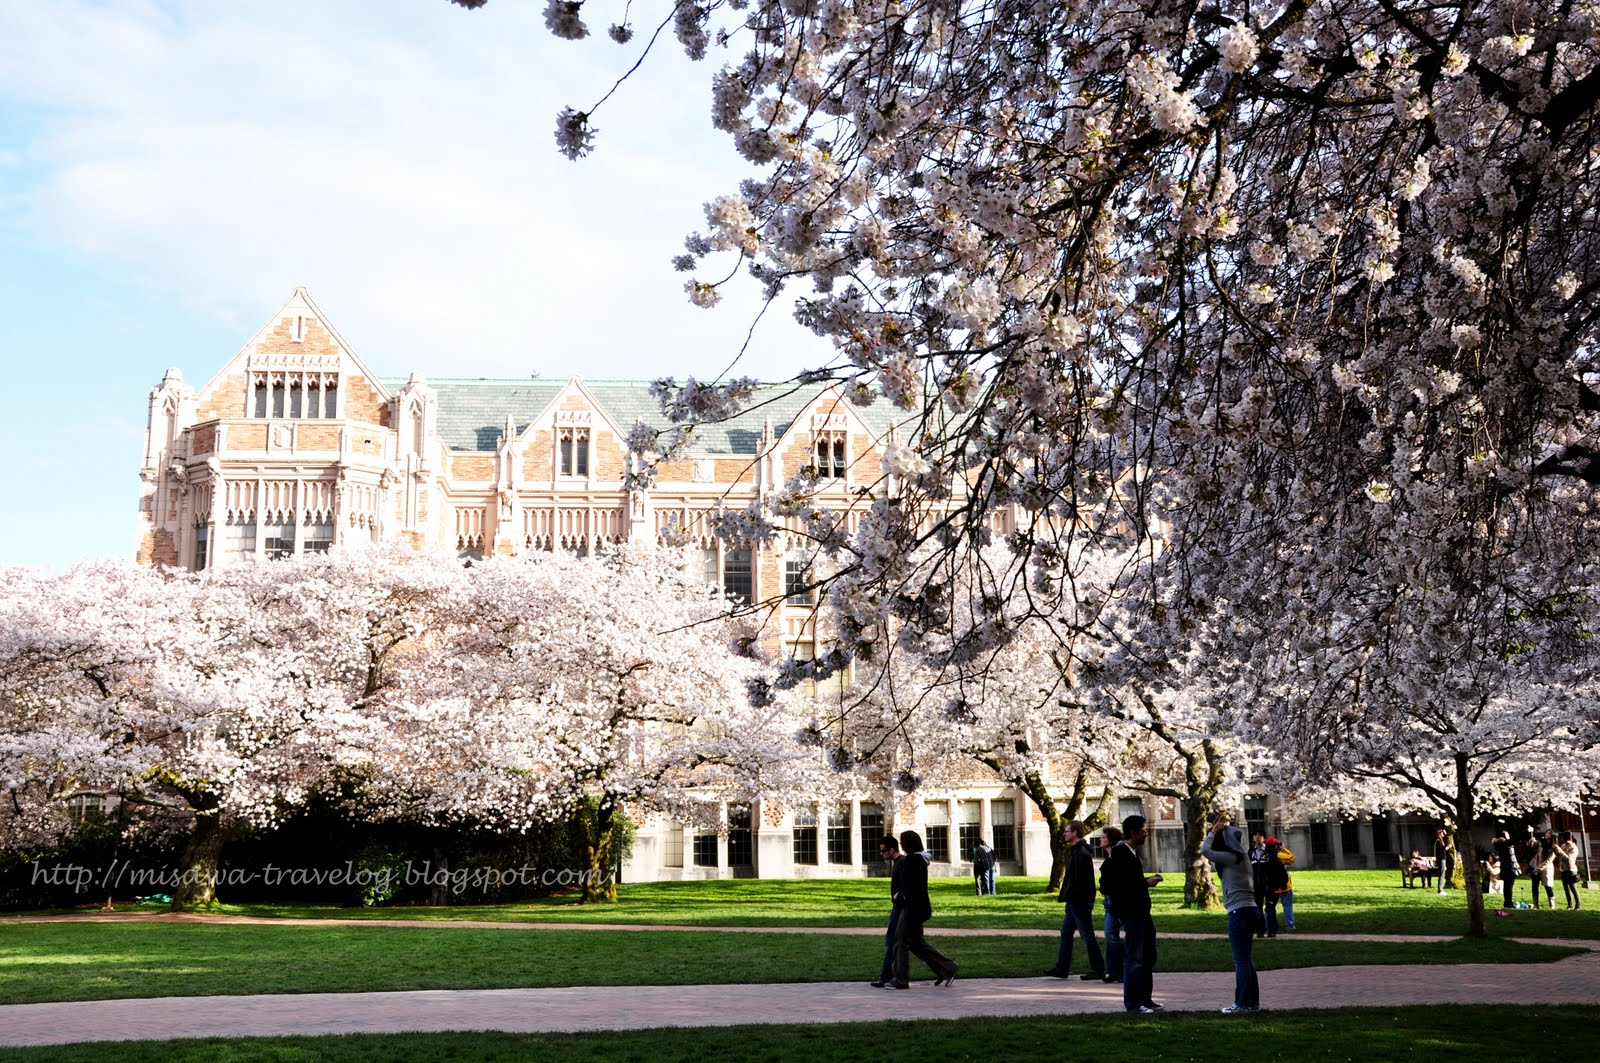 TRAVELOG: Cherry Blossoms at University of Washington